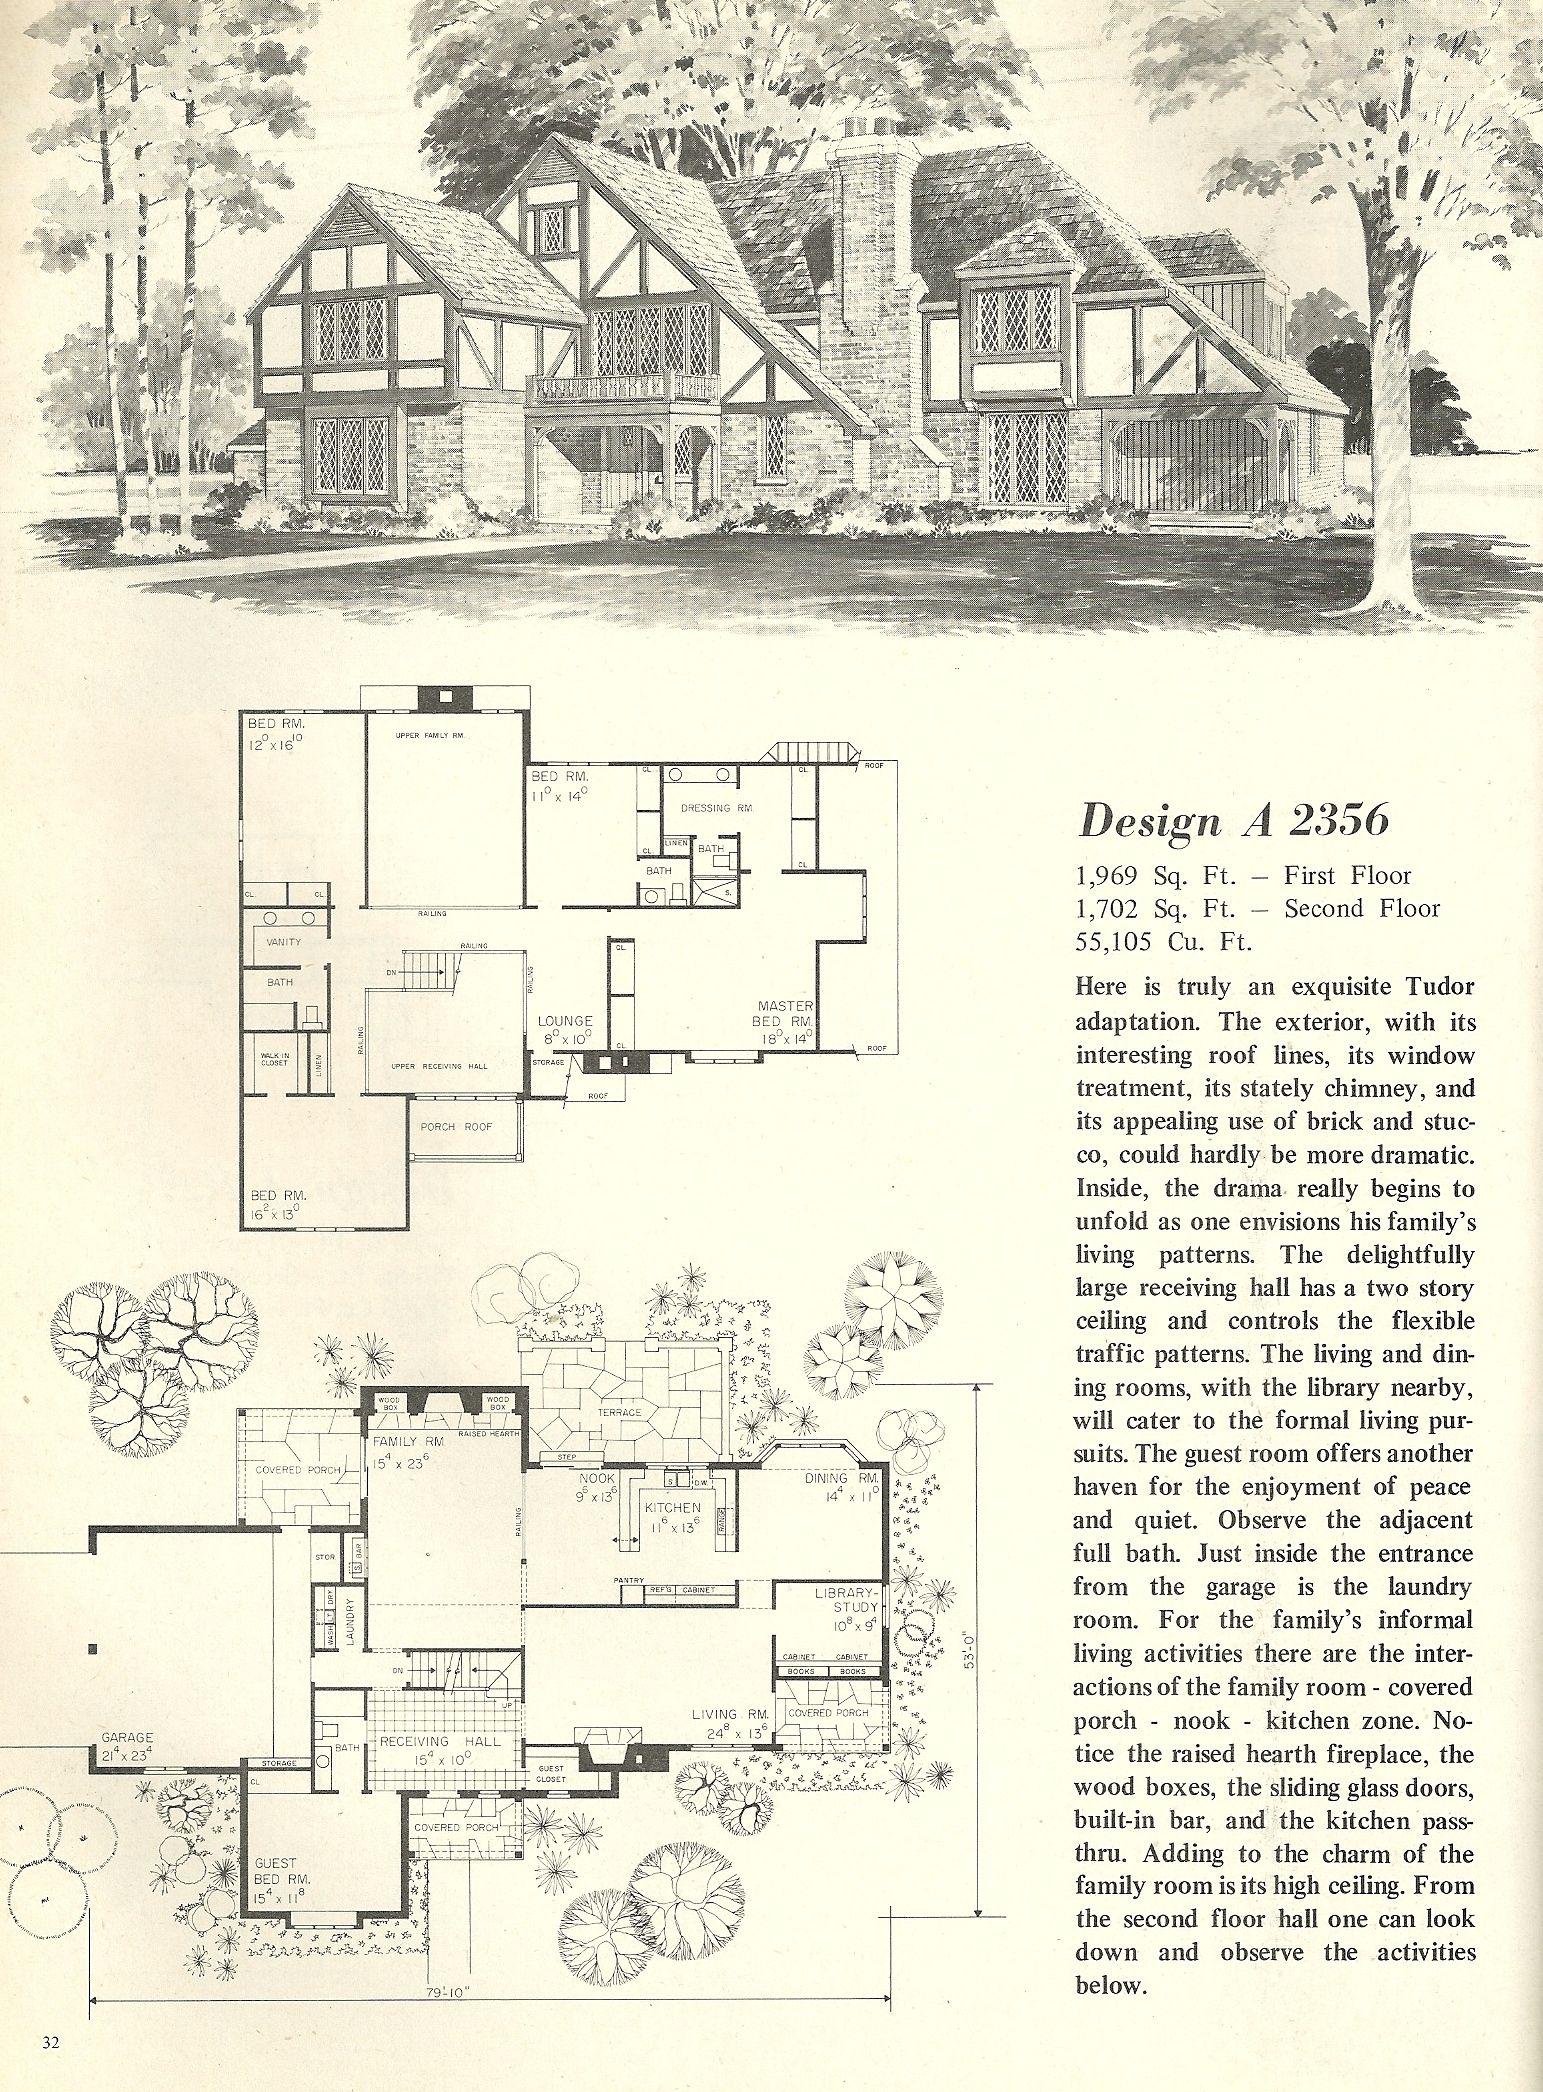 Vintage House Plans 2356 Vintage House Plans Cottage House Plans Tudor Style Homes